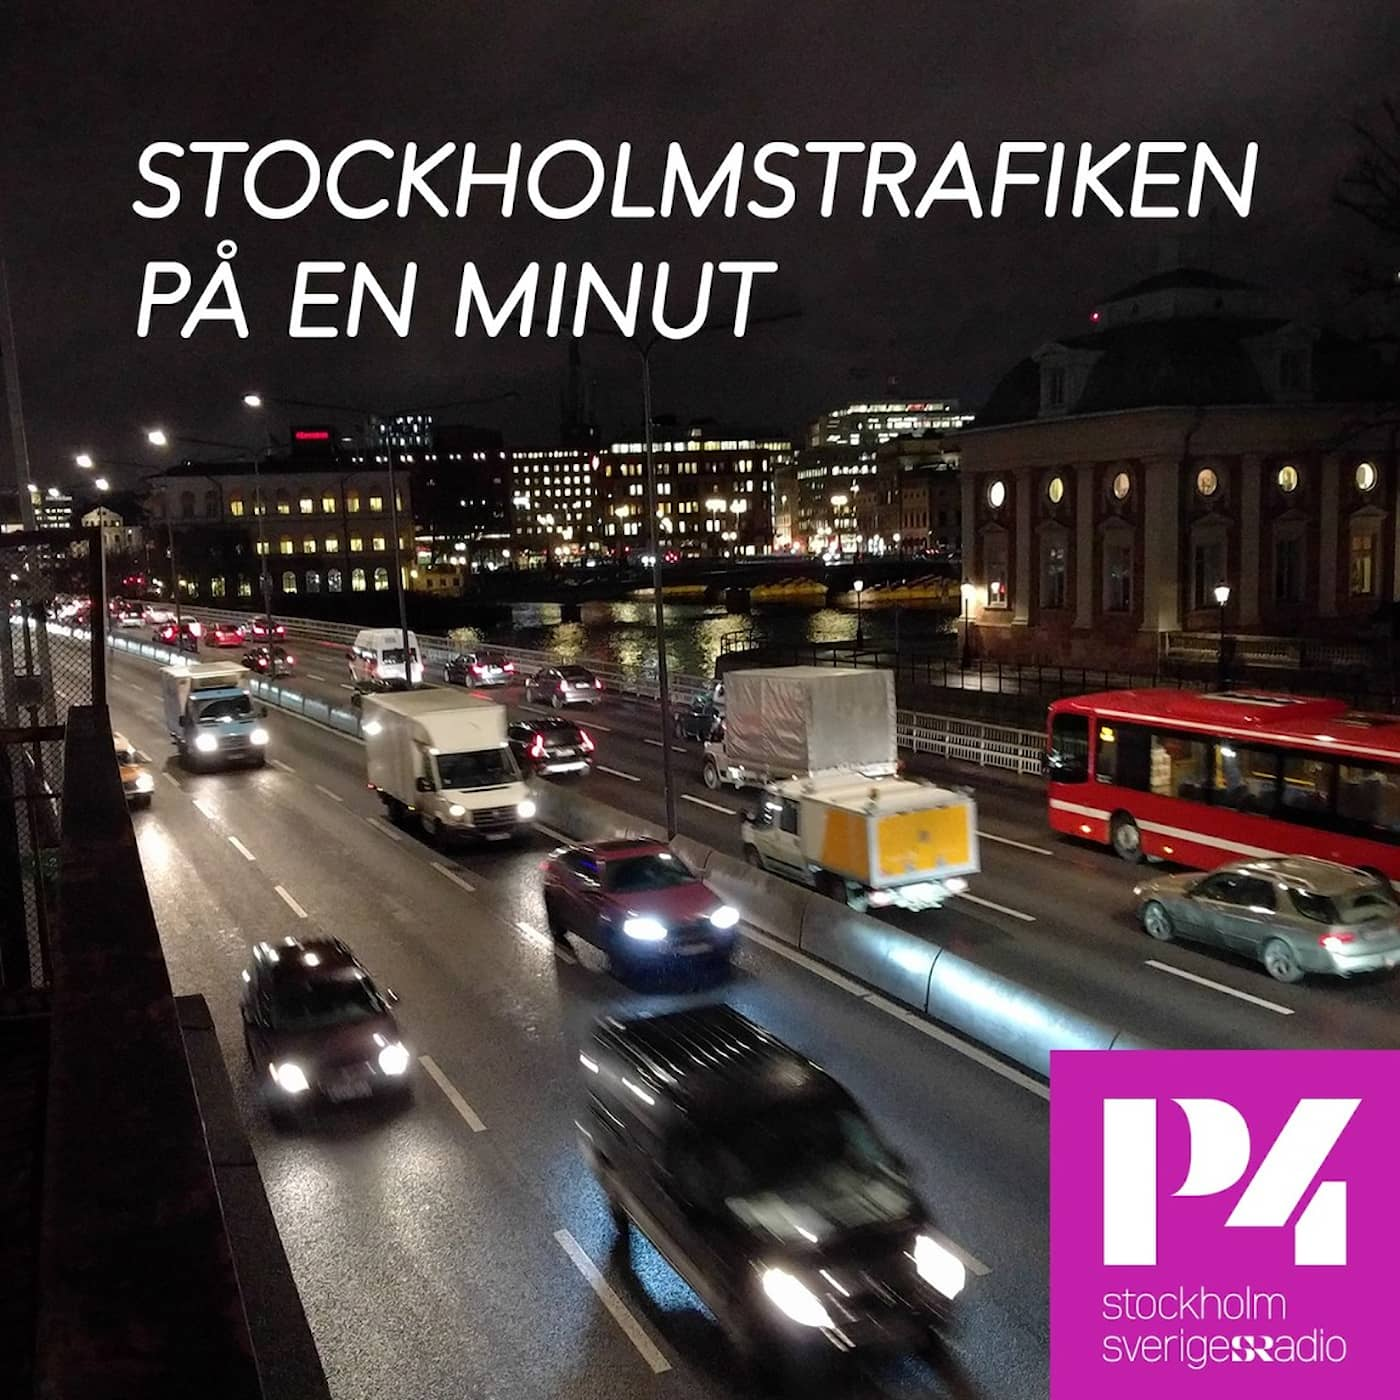 Stockholmstrafiken på en minut